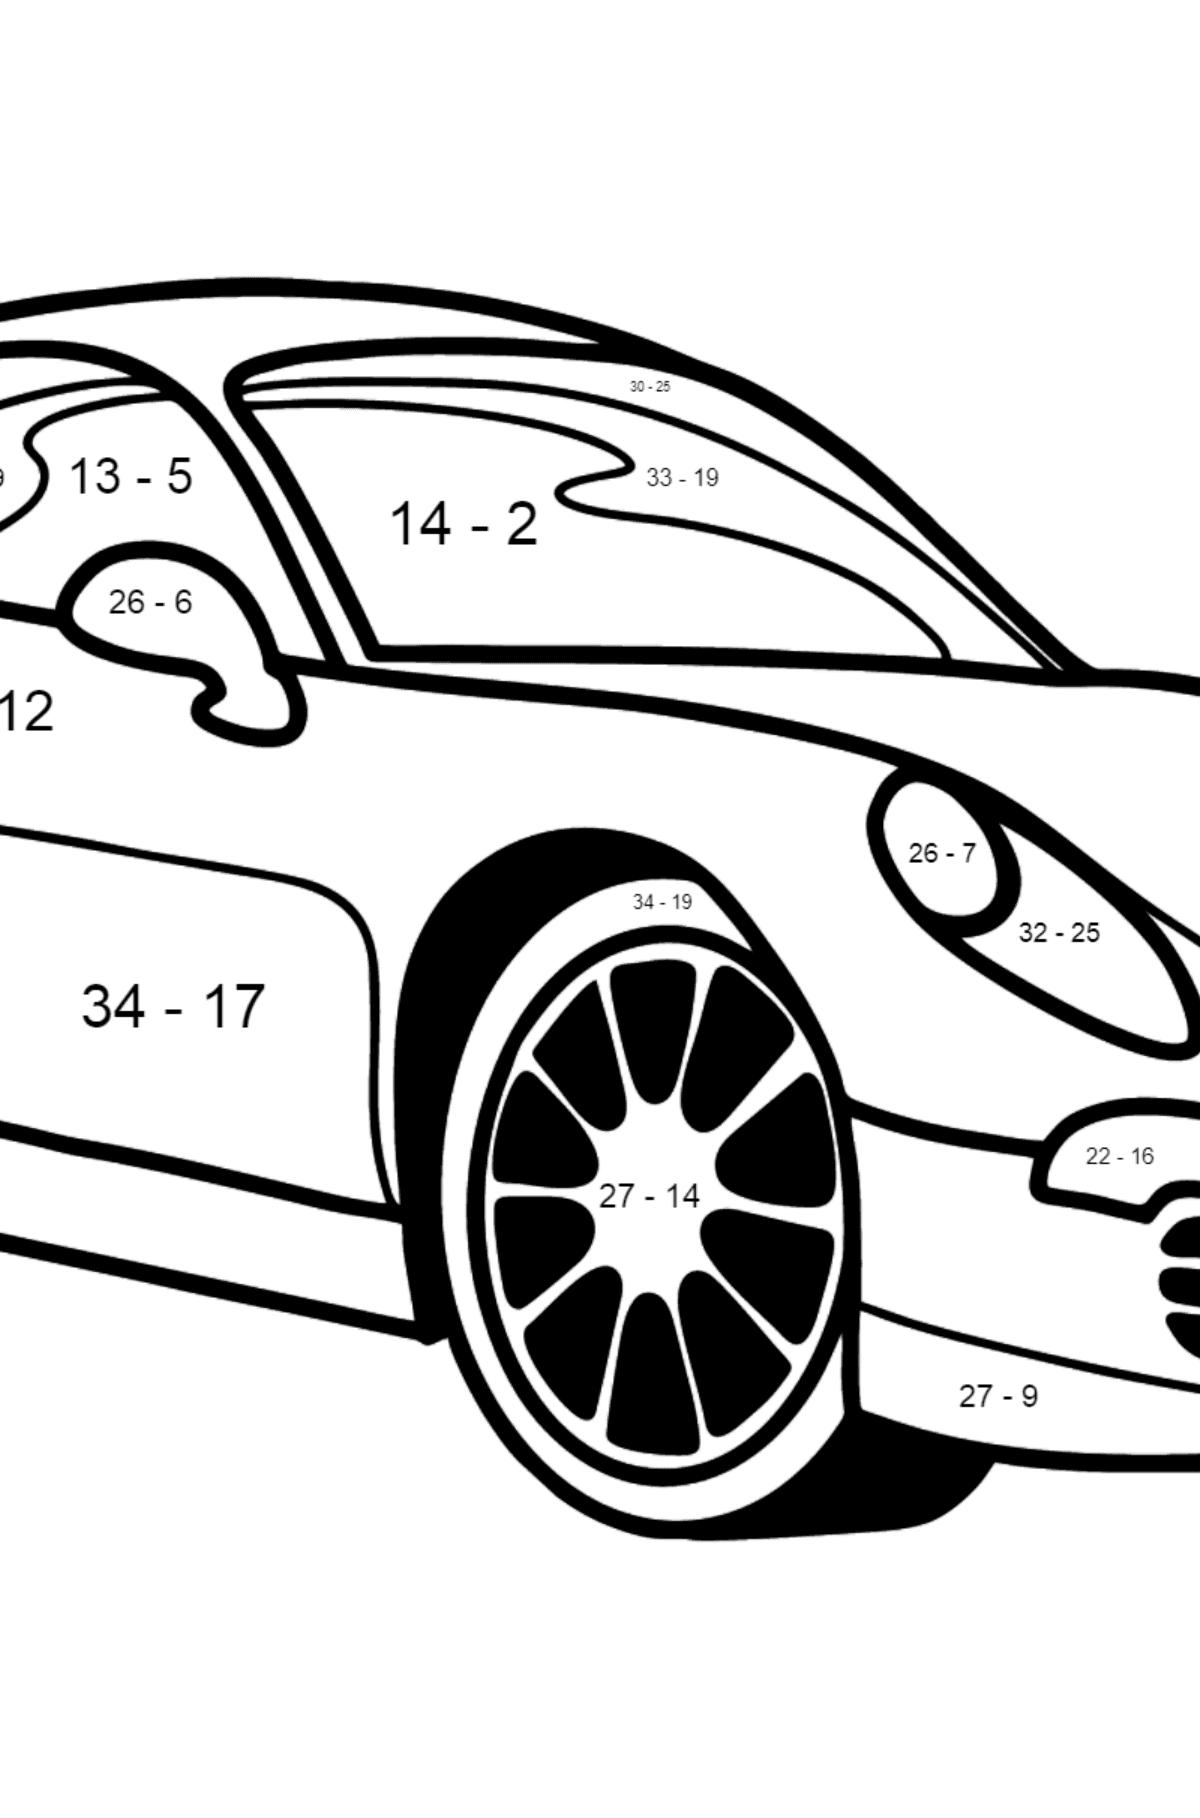 Porsche Cayman Sports Car coloring page - Math Coloring - Subtraction for Kids